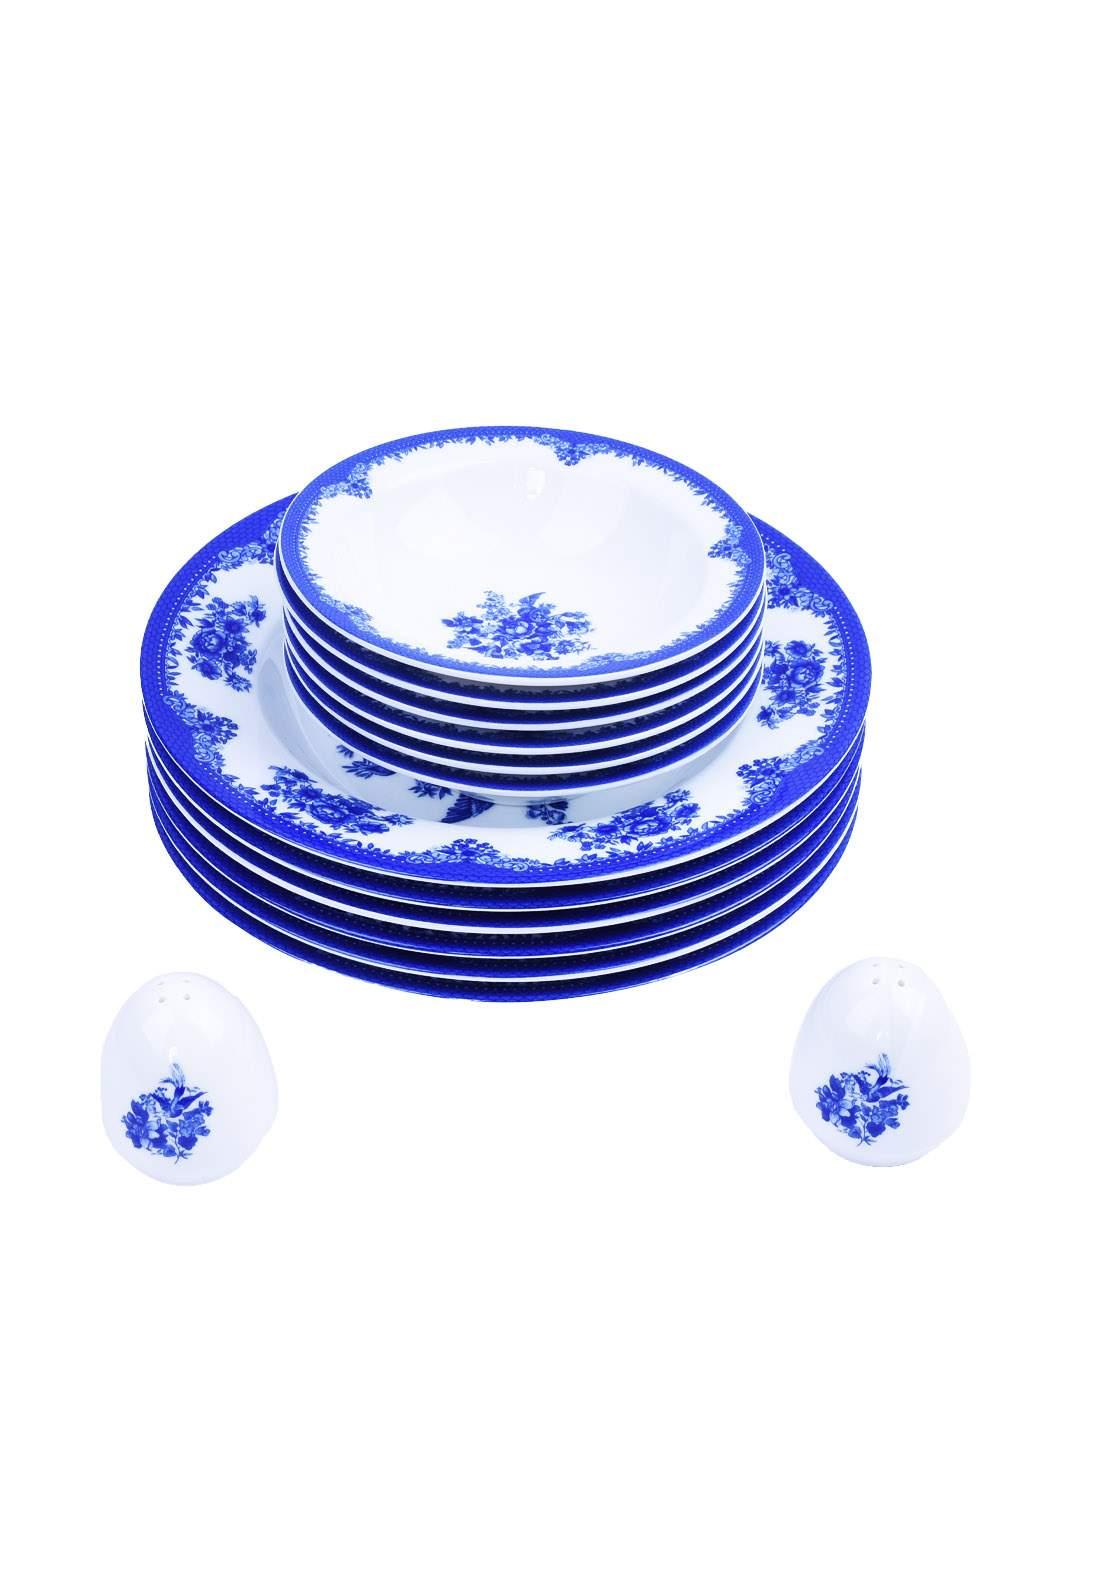 OzlifeTulu porselen Set سيت اطباق 28 طبق